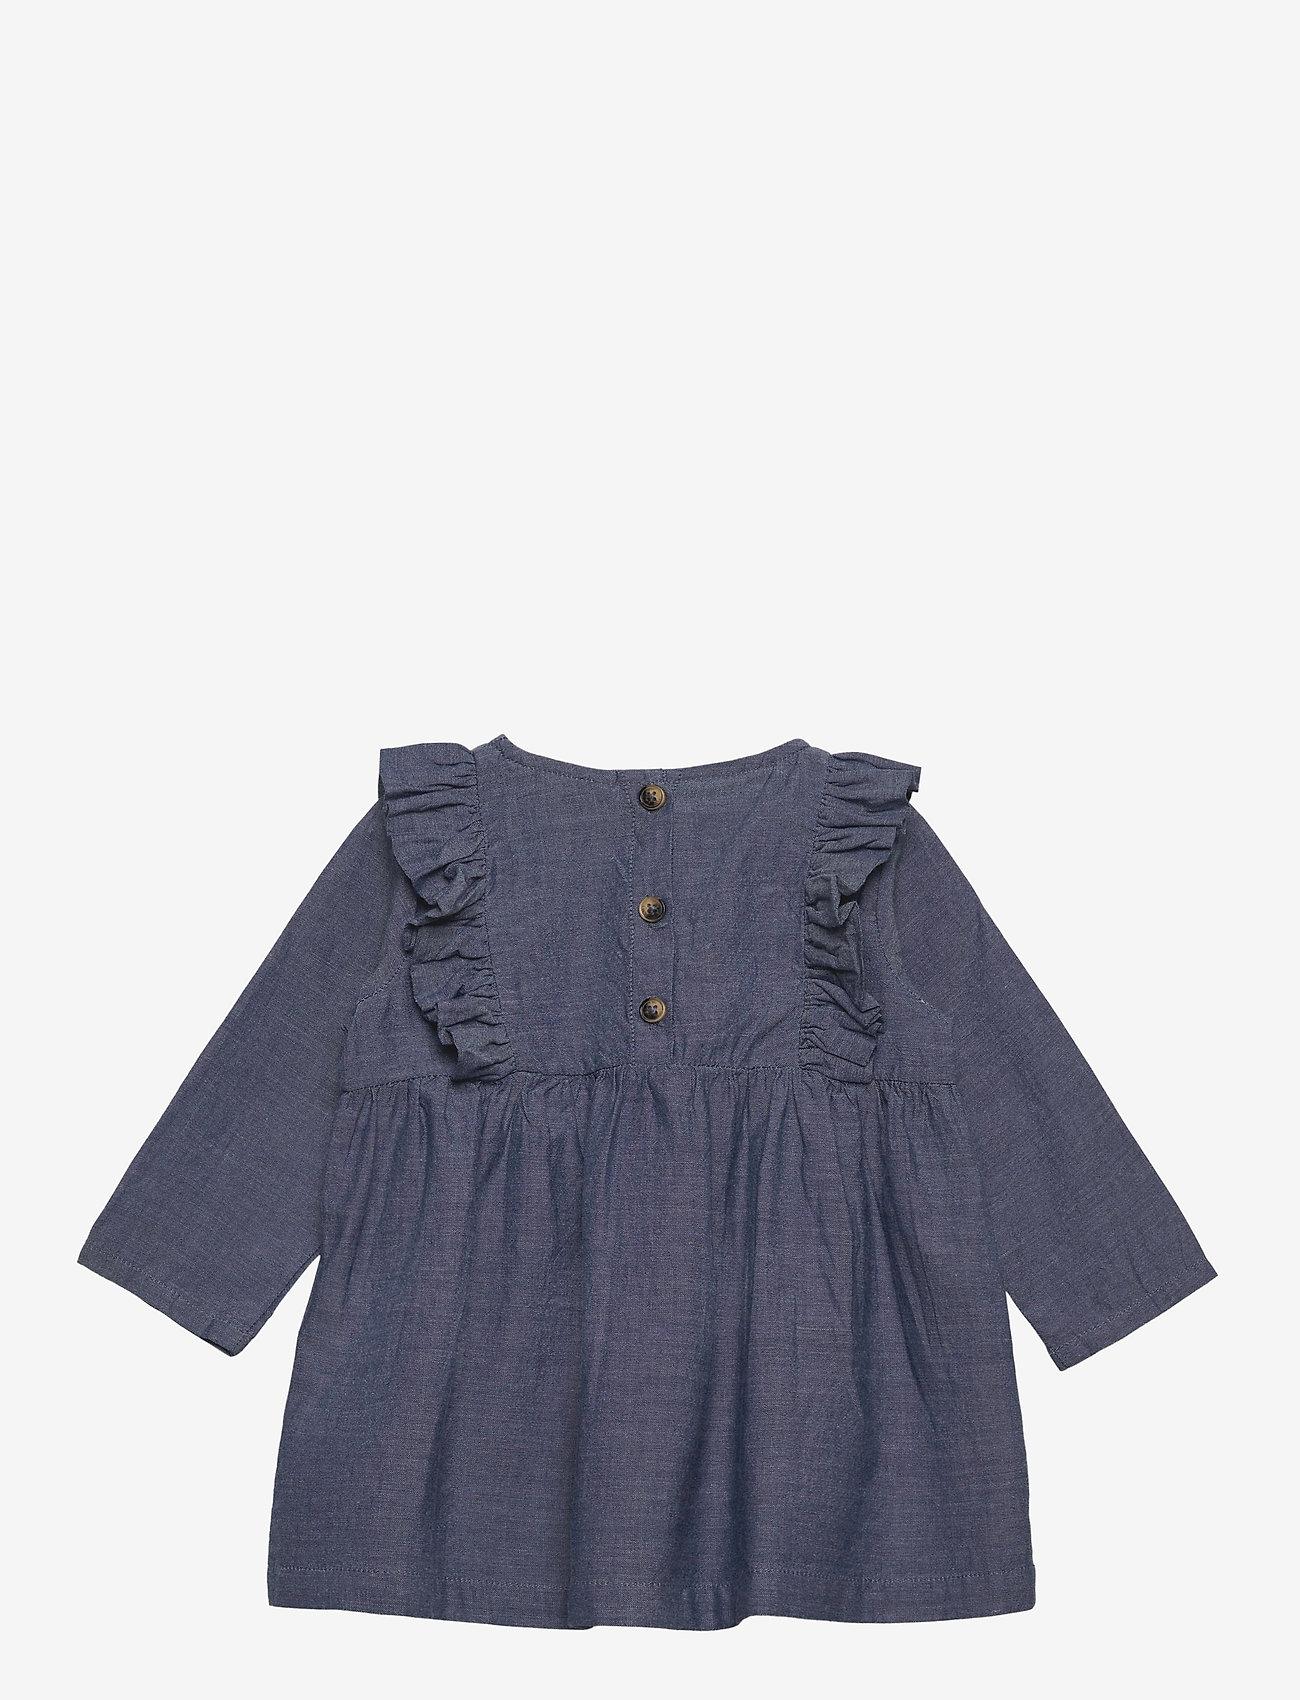 MarMar Cph - Dikte - jurken - denim blue - 1